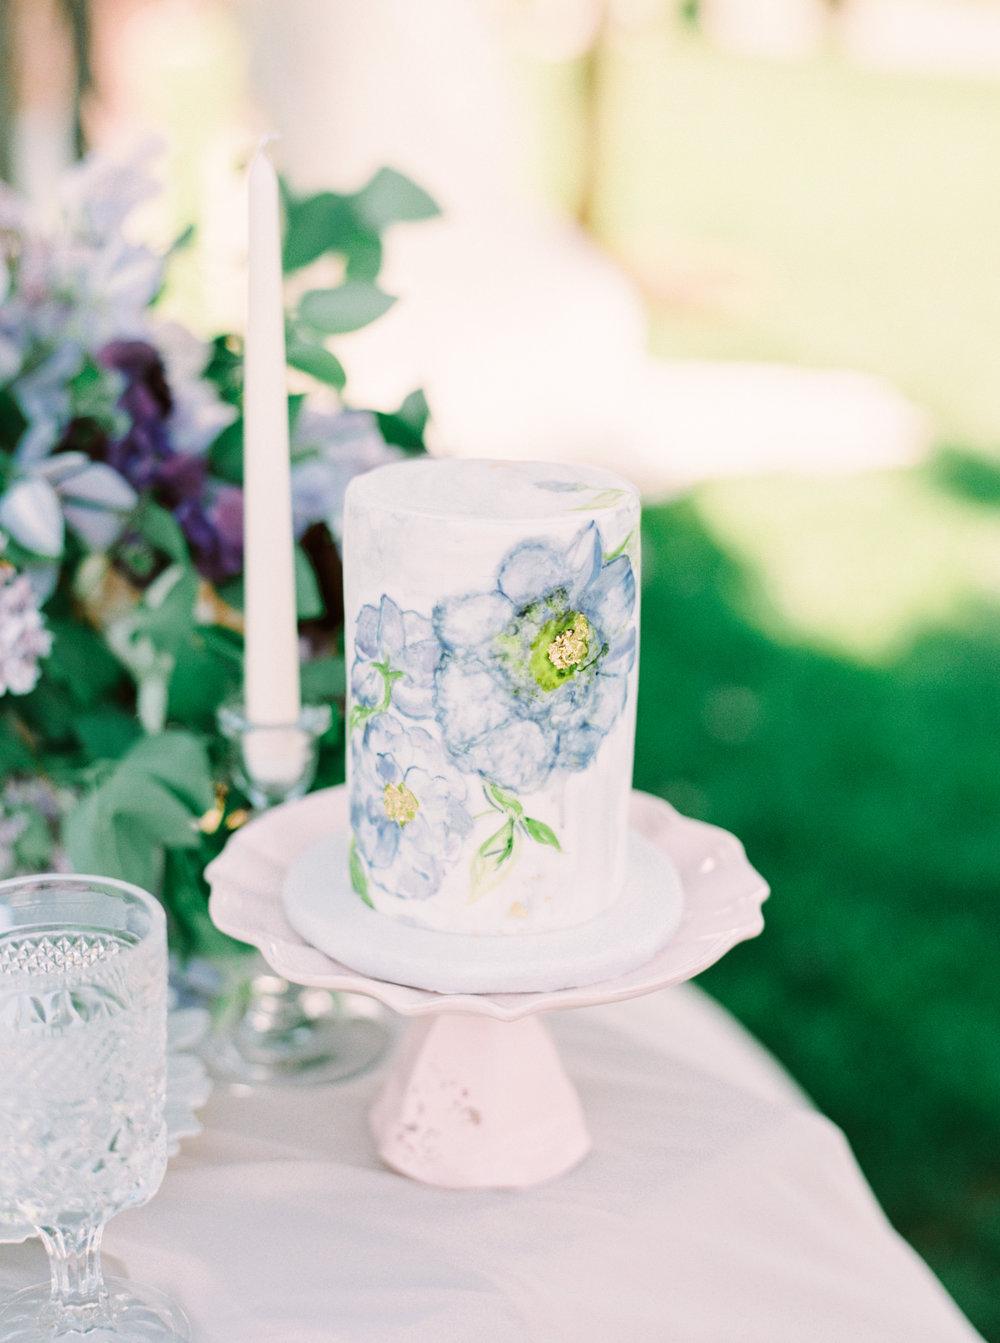 This-Love-of-Yours-Kirigin-Cellars-Flower-Arch-Styled-Shoot-128.jpg